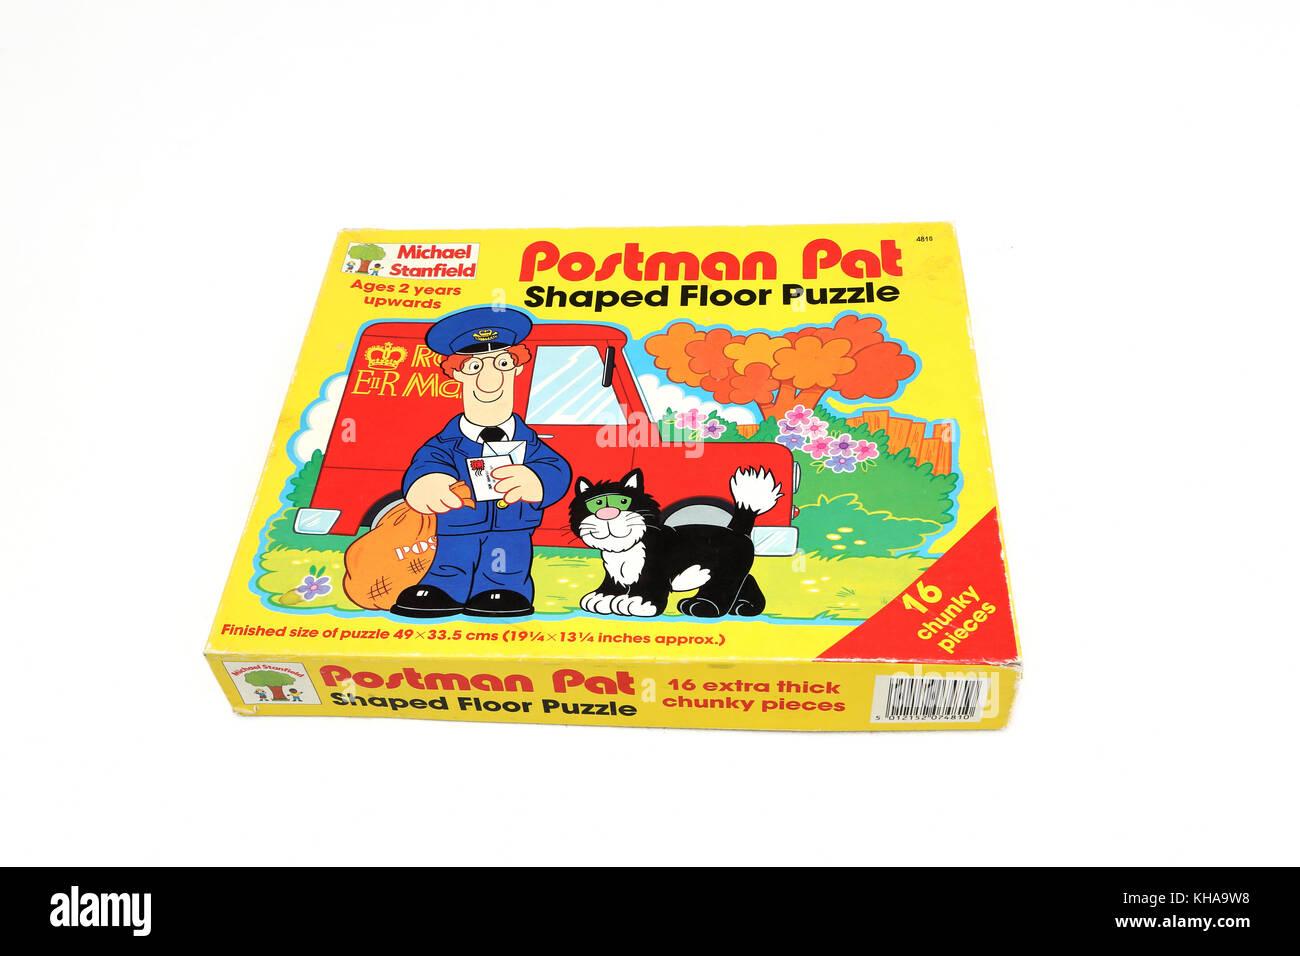 Jigsaw Puzzle Box Stock Photos Amp Jigsaw Puzzle Box Stock